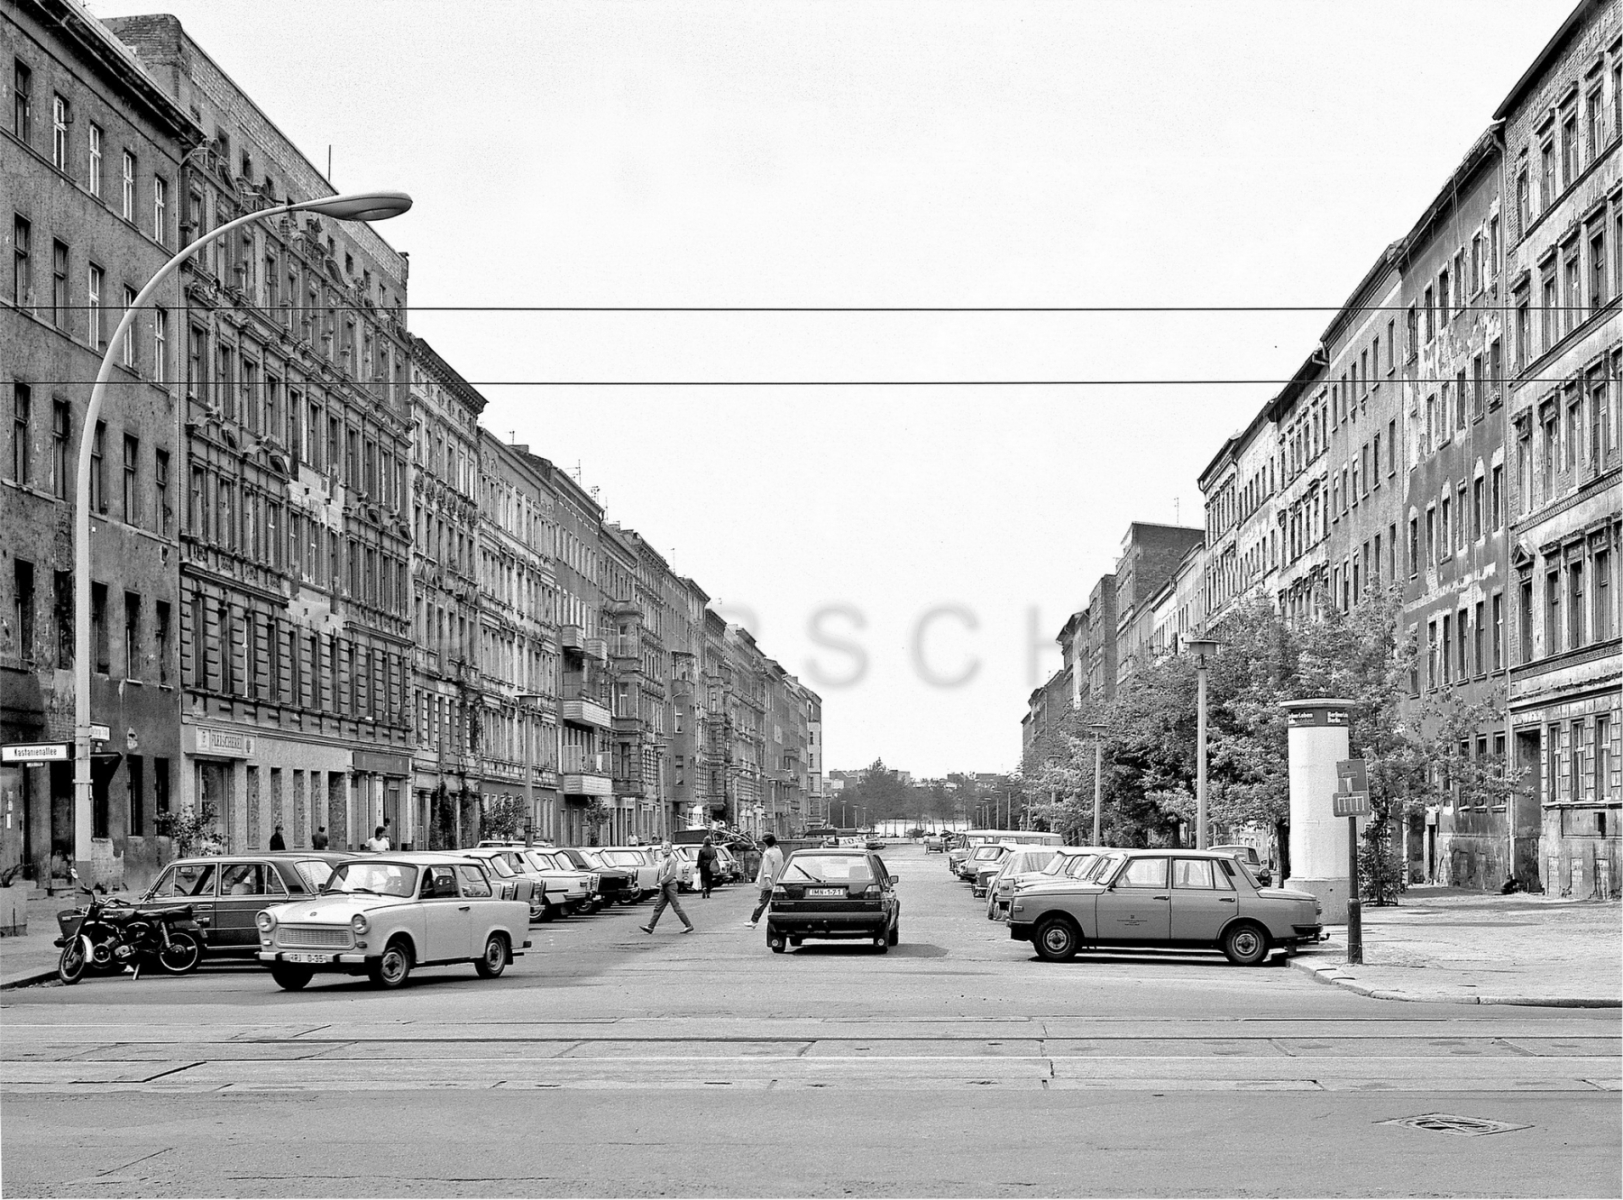 Nr02-051_Oderbergerstrasse-9.6.1989